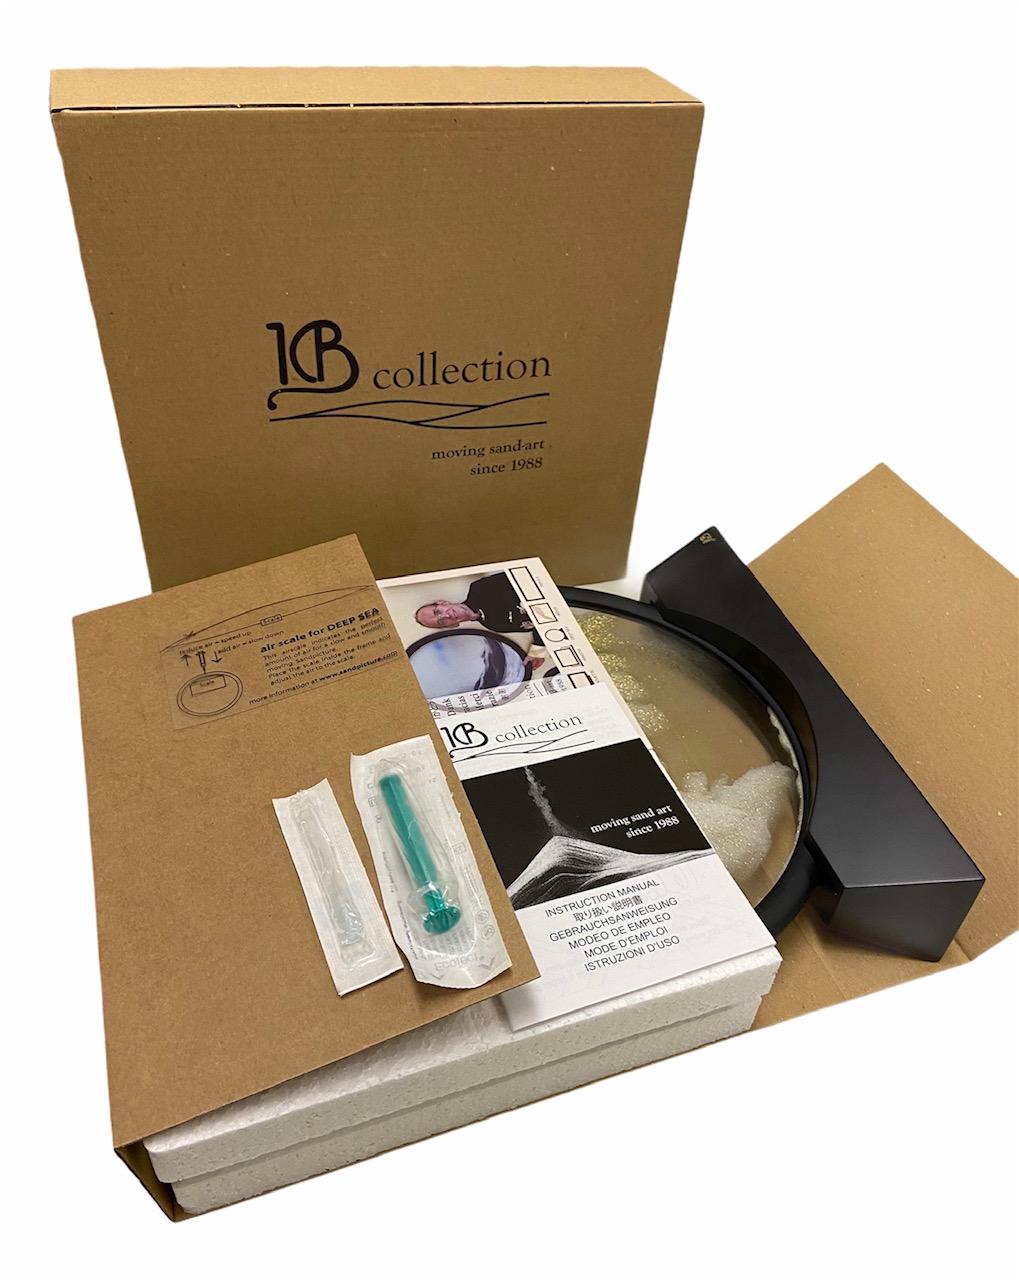 KB collection サンドピクチャーディープシーパシフィック